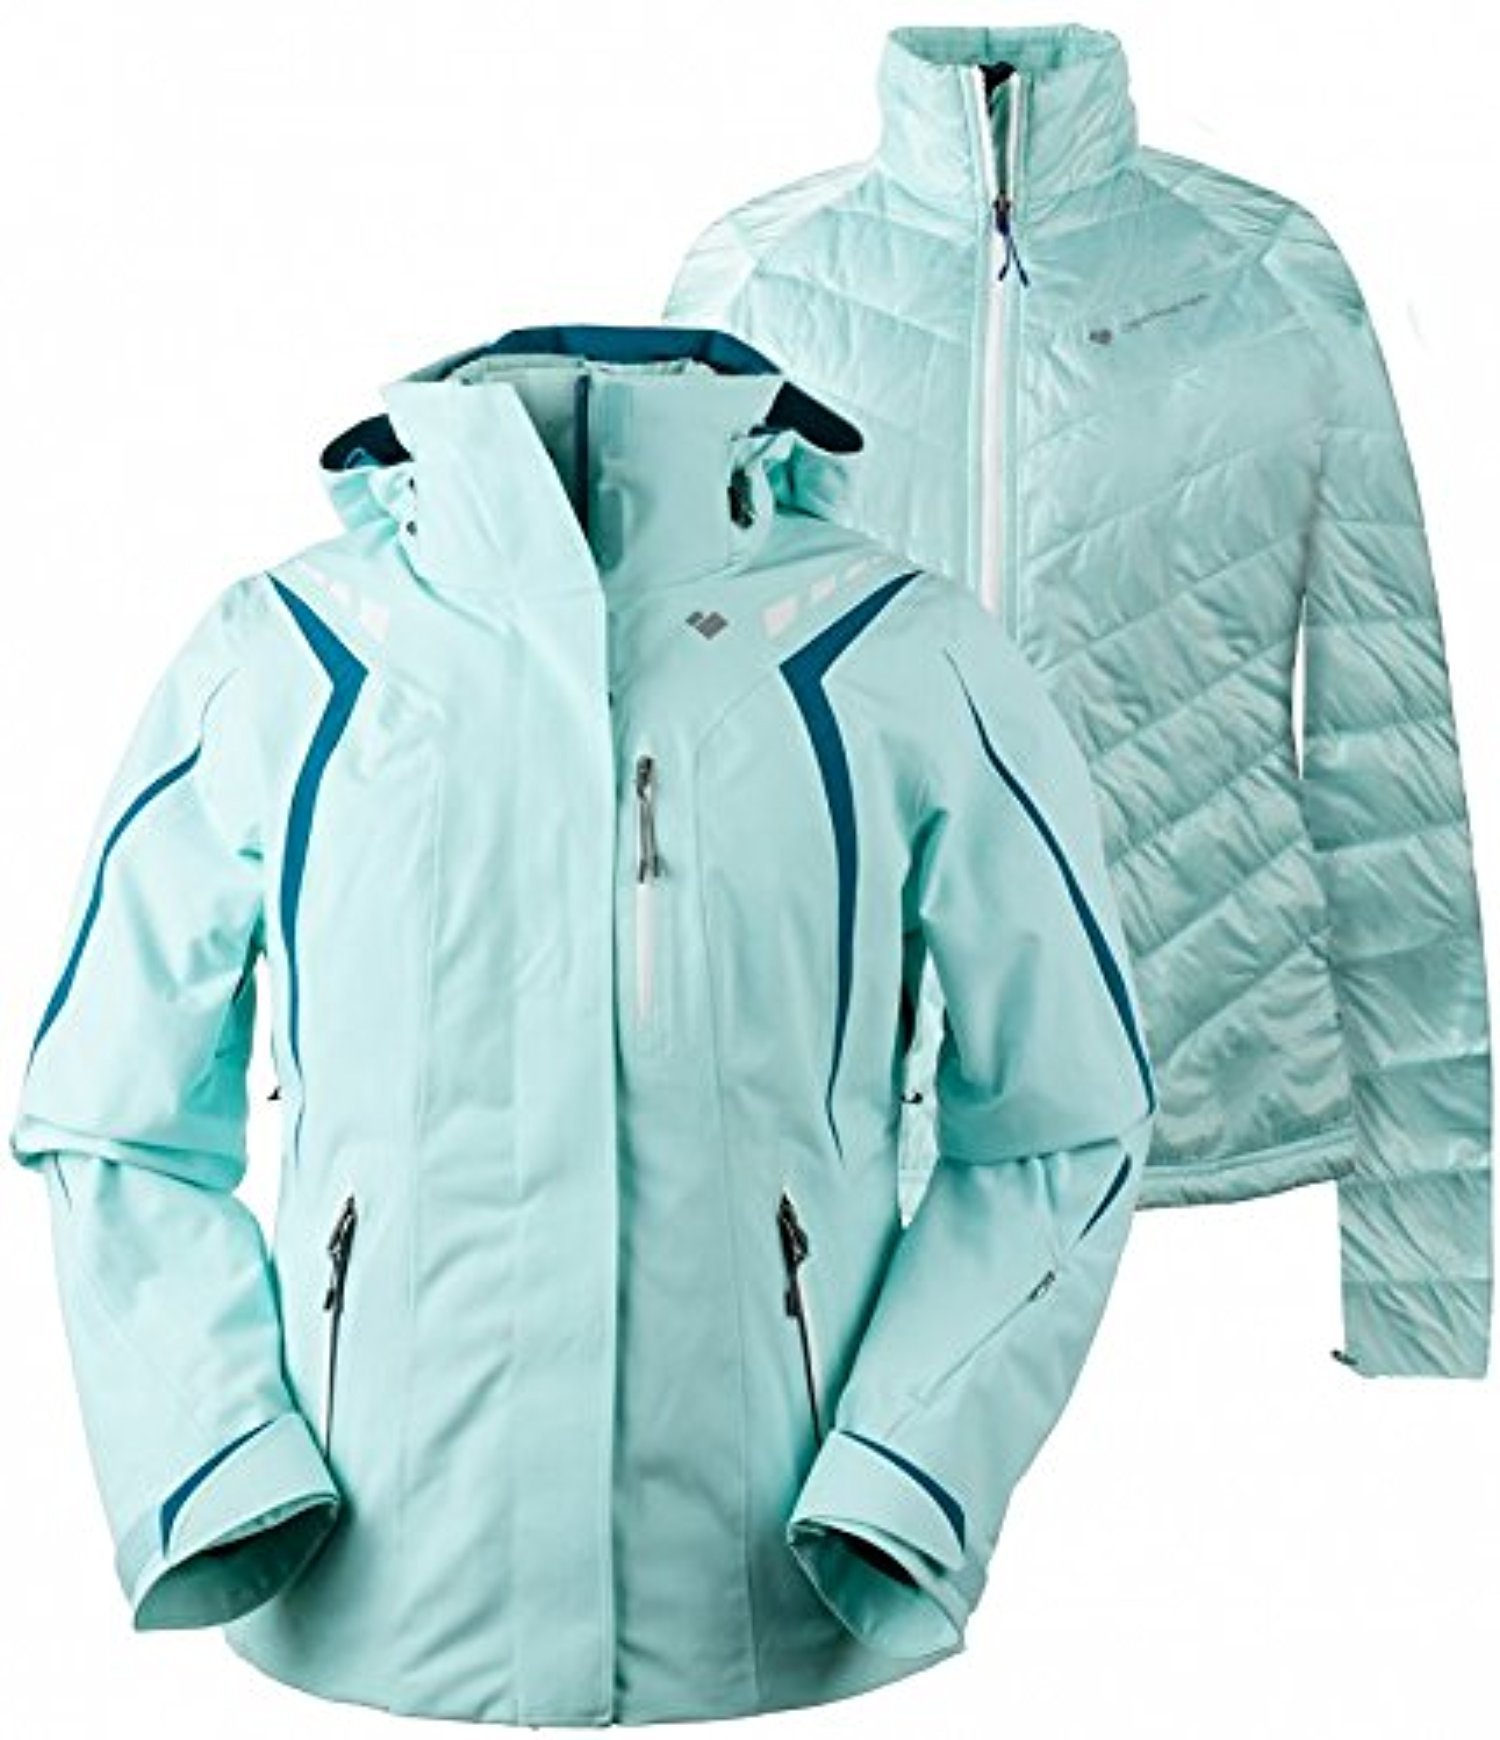 Obermeyer Women's Juno System Jacket Sea Glass 2 & E-tip Glove Bundle